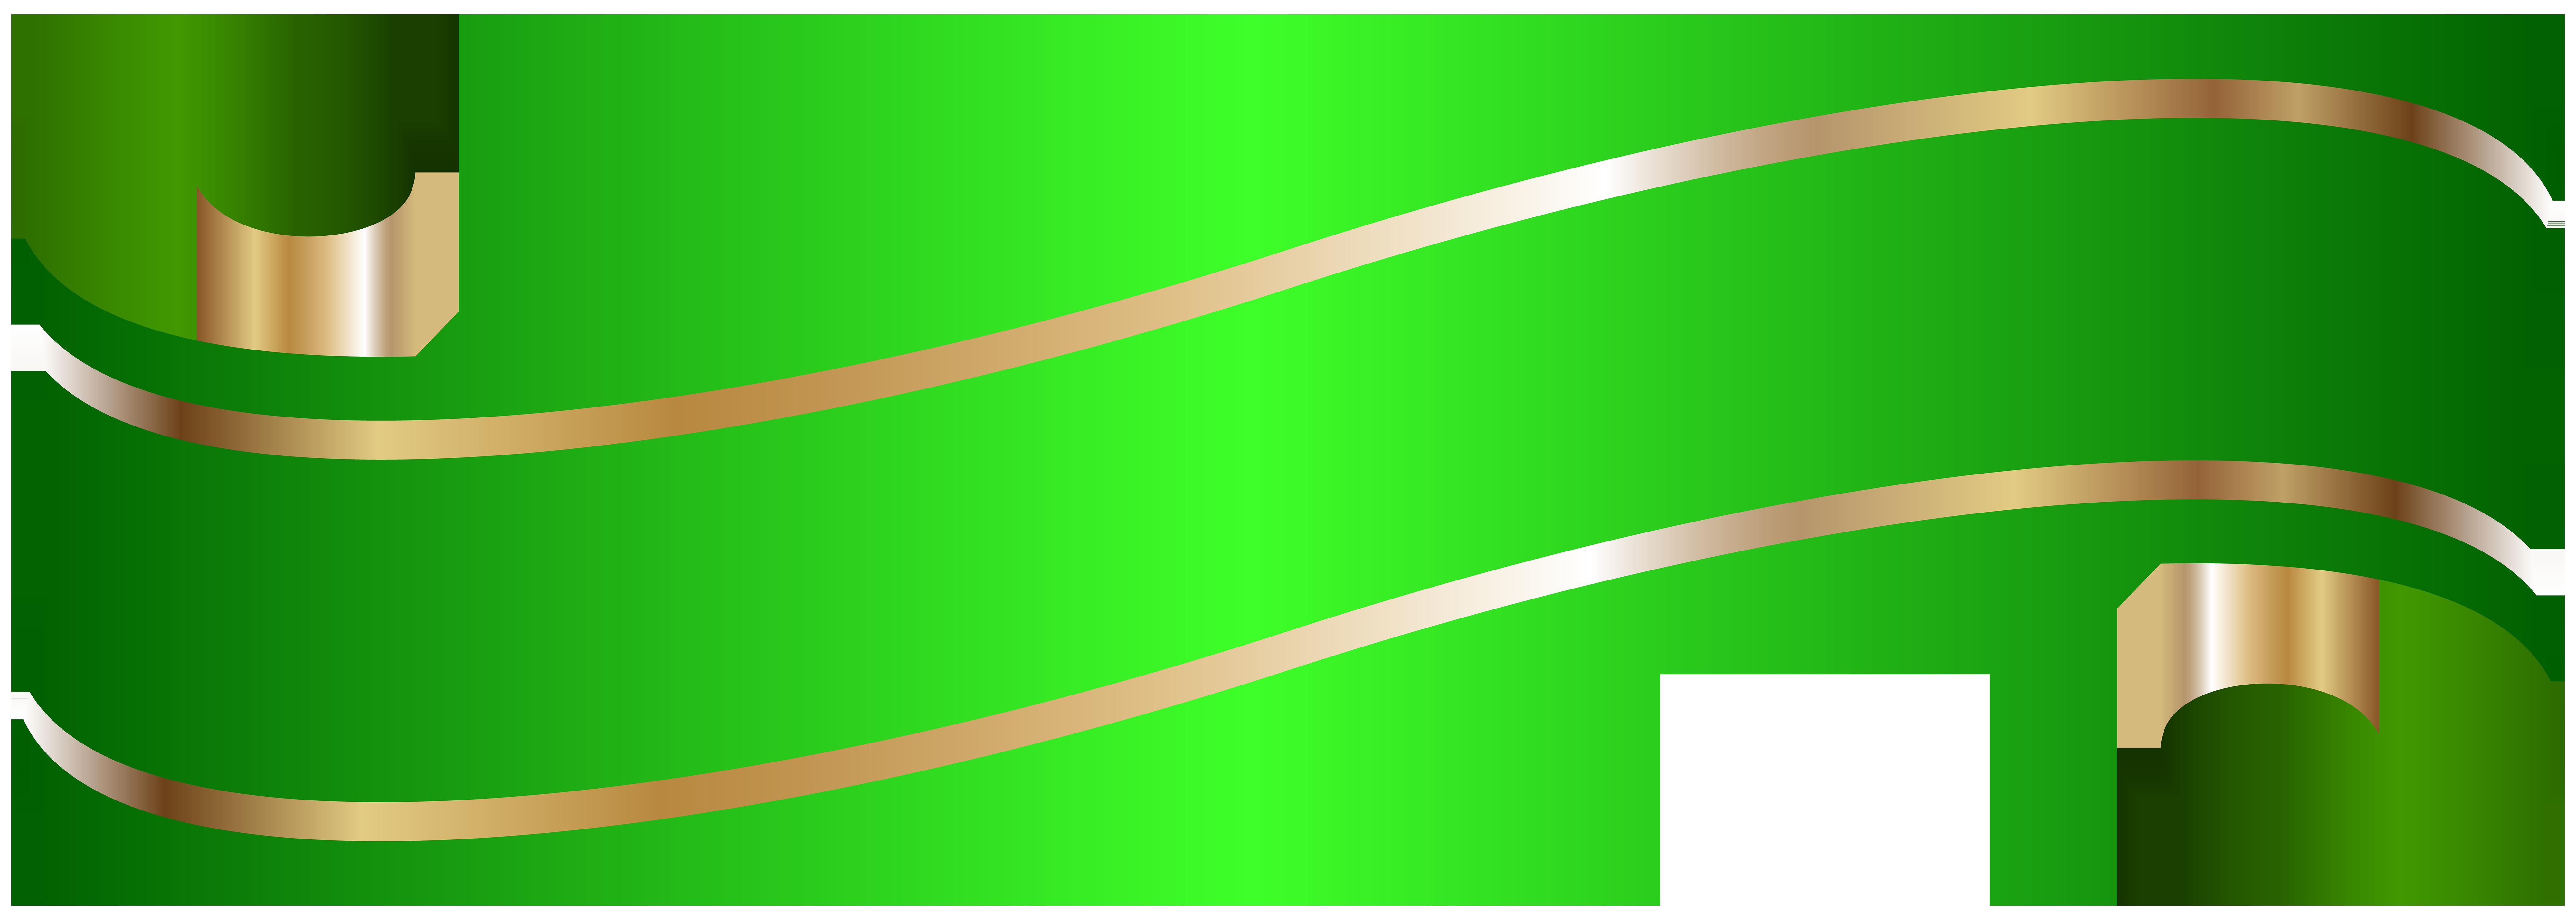 8000x2856 Elegant Banner Green Png Clip Artu200b Gallery Yopriceville